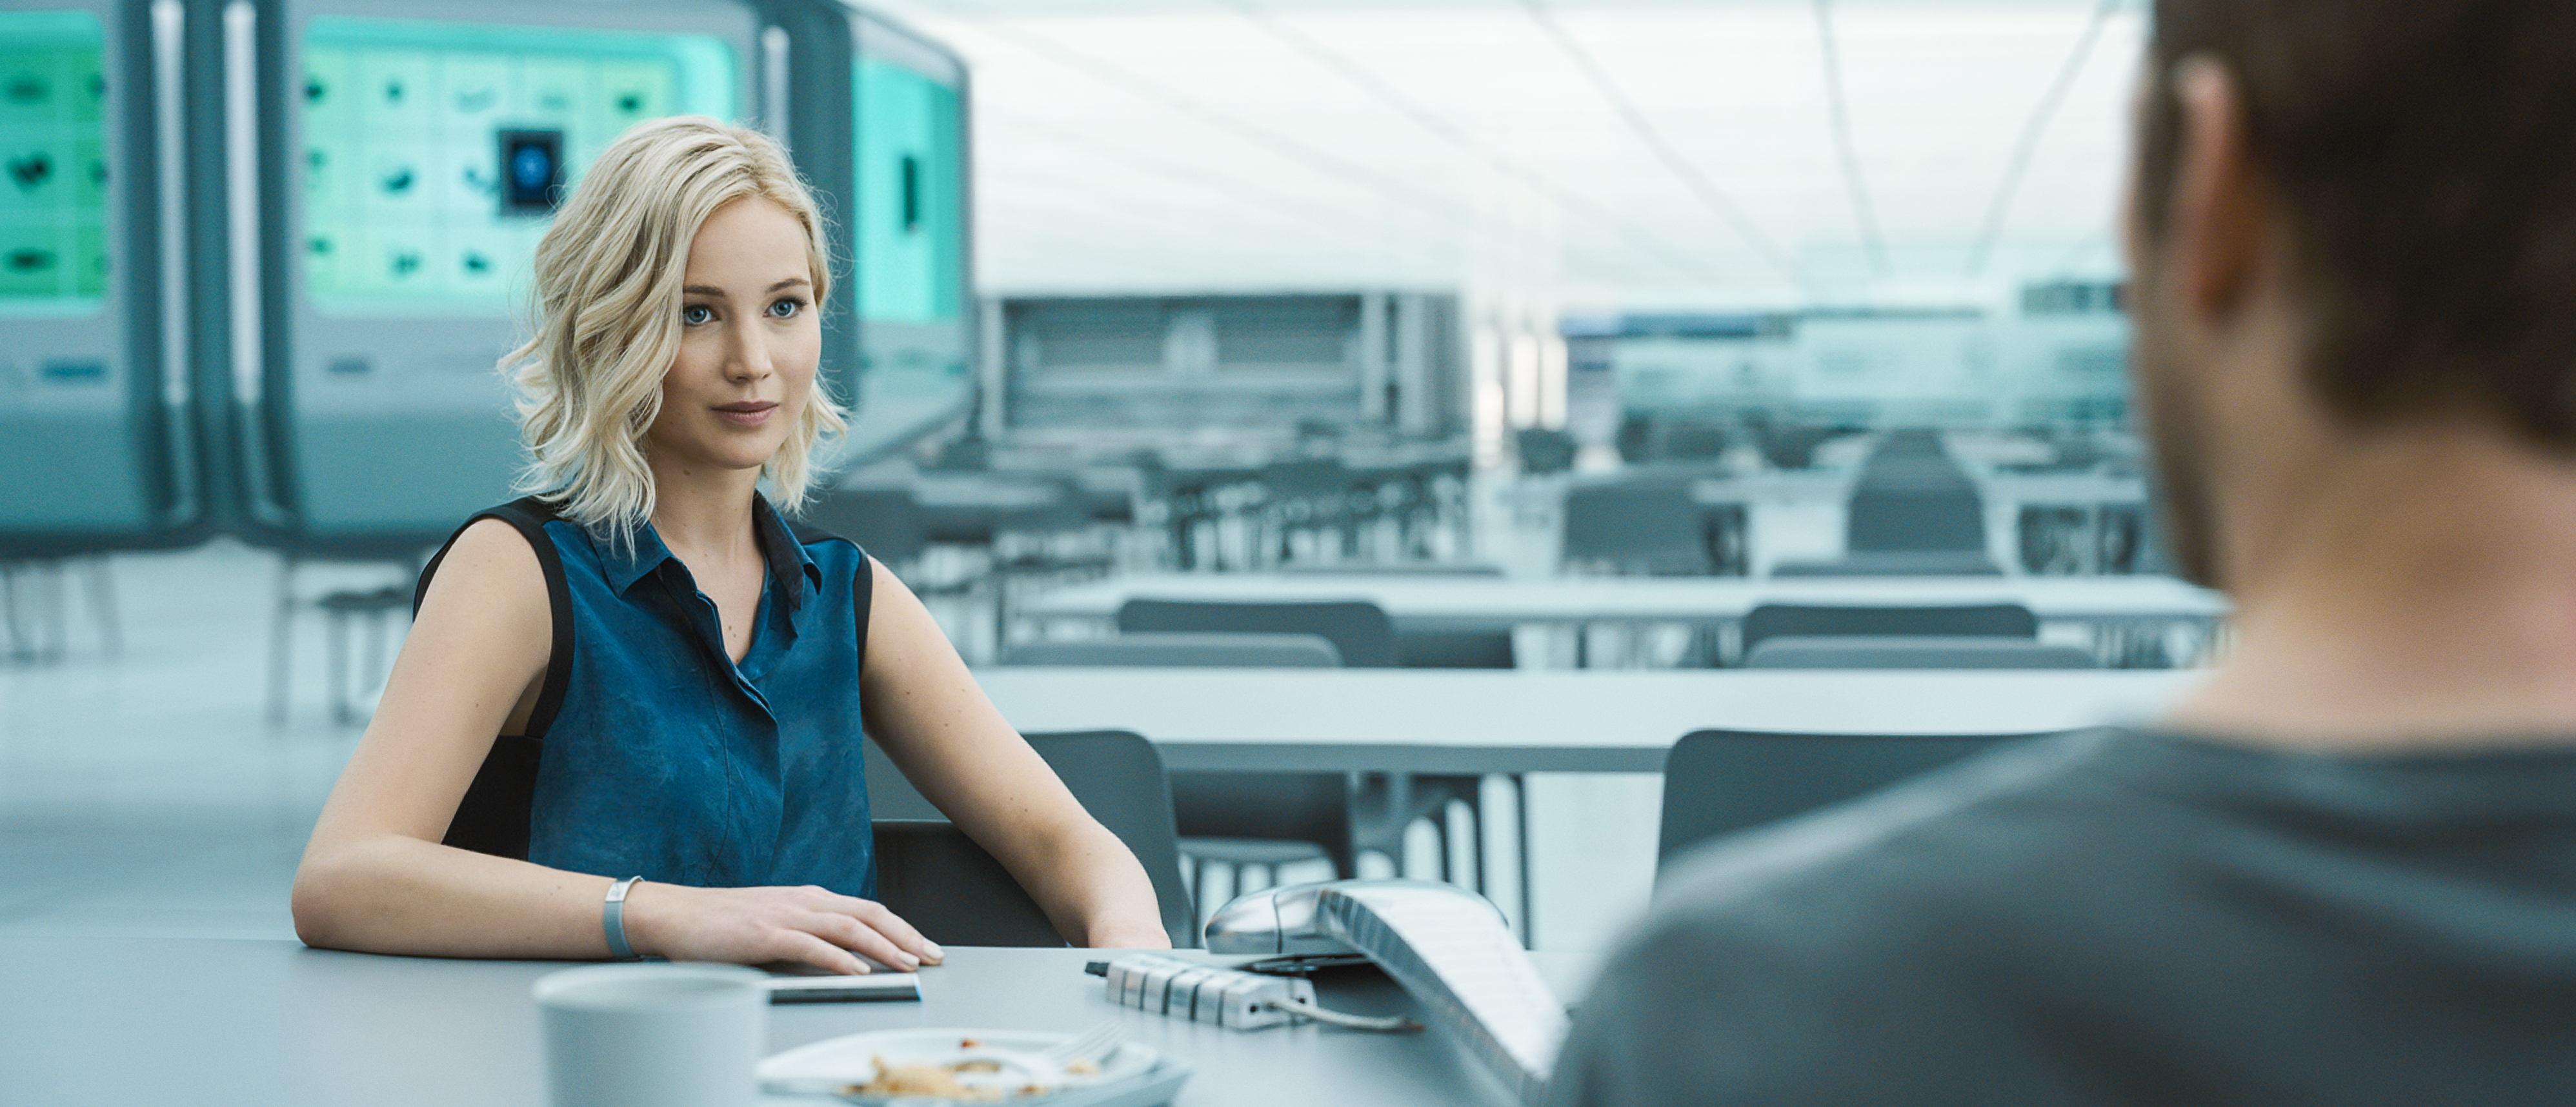 Jennifer Lawrence, Chris Pratt - Passengers.jpeg